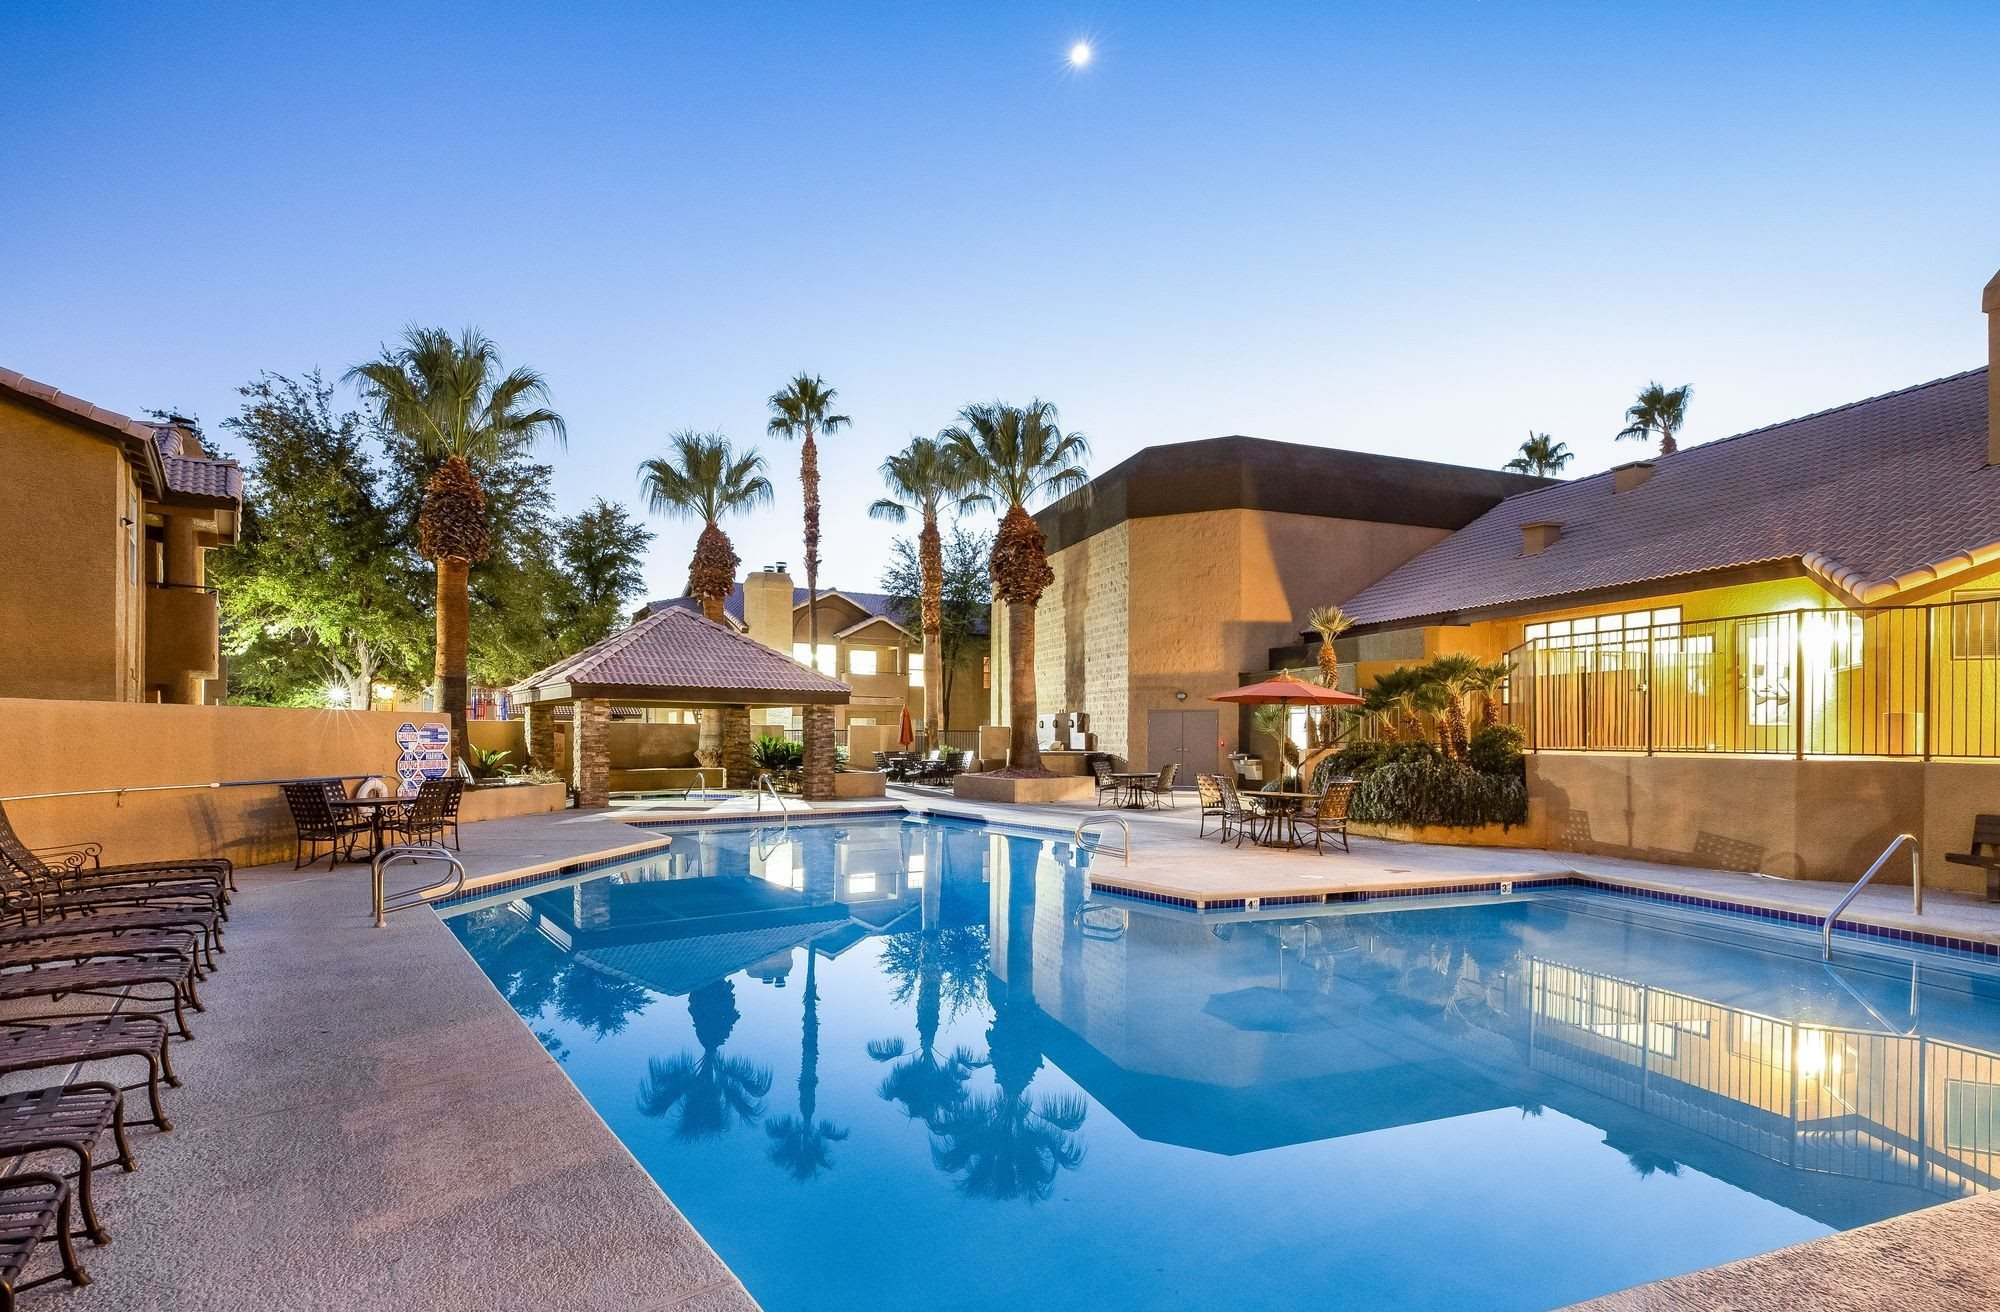 2 Swimming Pools, Indoor Lap & Outdoor at Village at Desert Lakes, Las Vegas, 89117